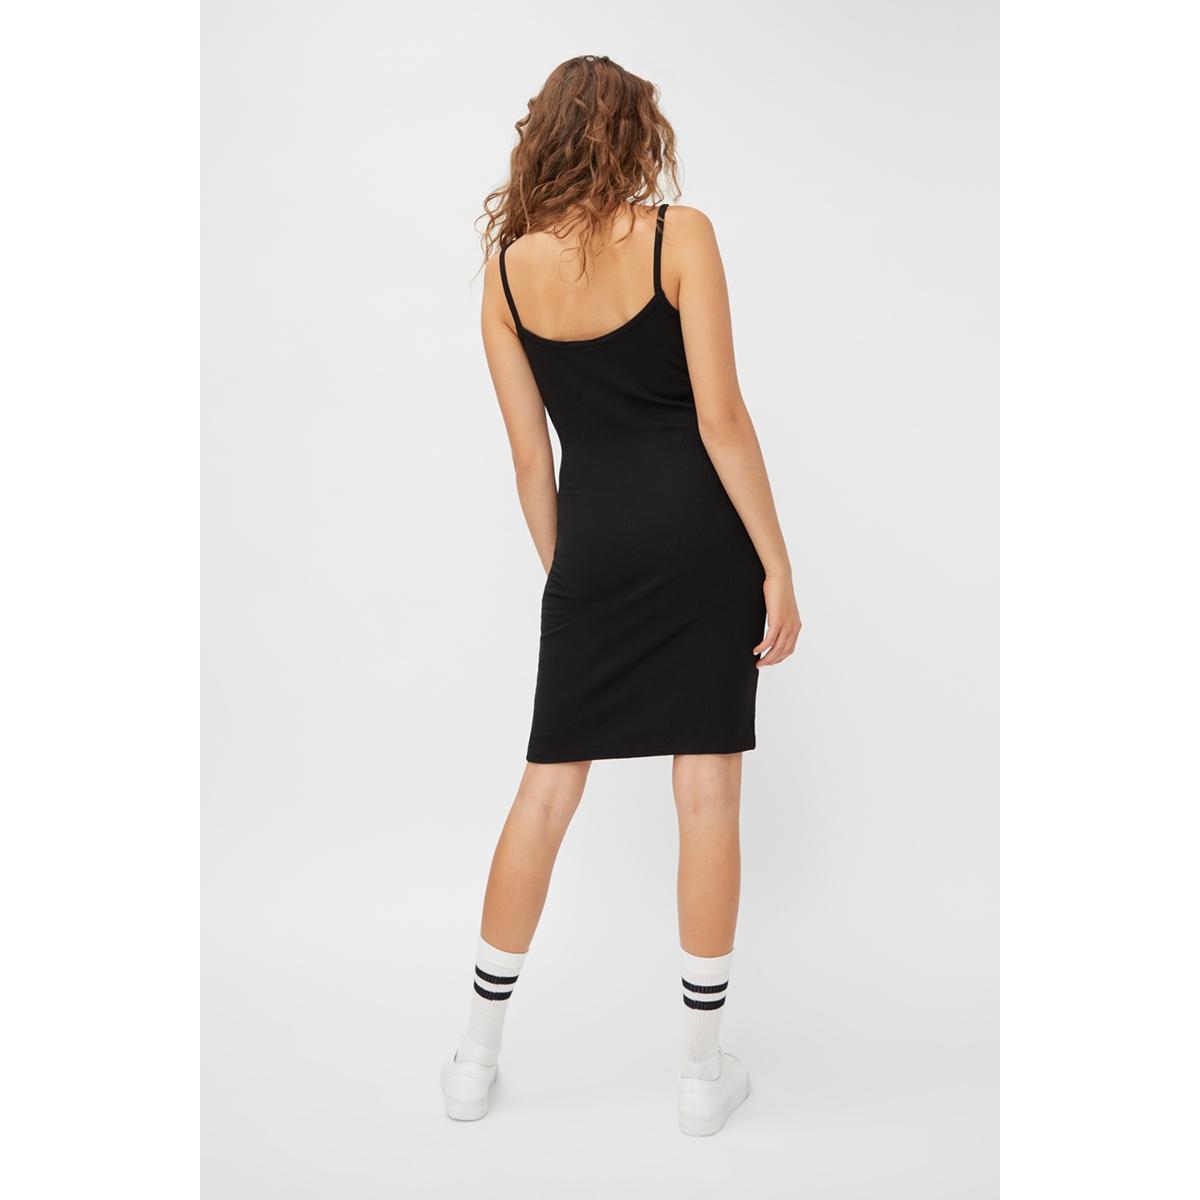 nmmox s/l dress color 27011849 noisy may jurk black